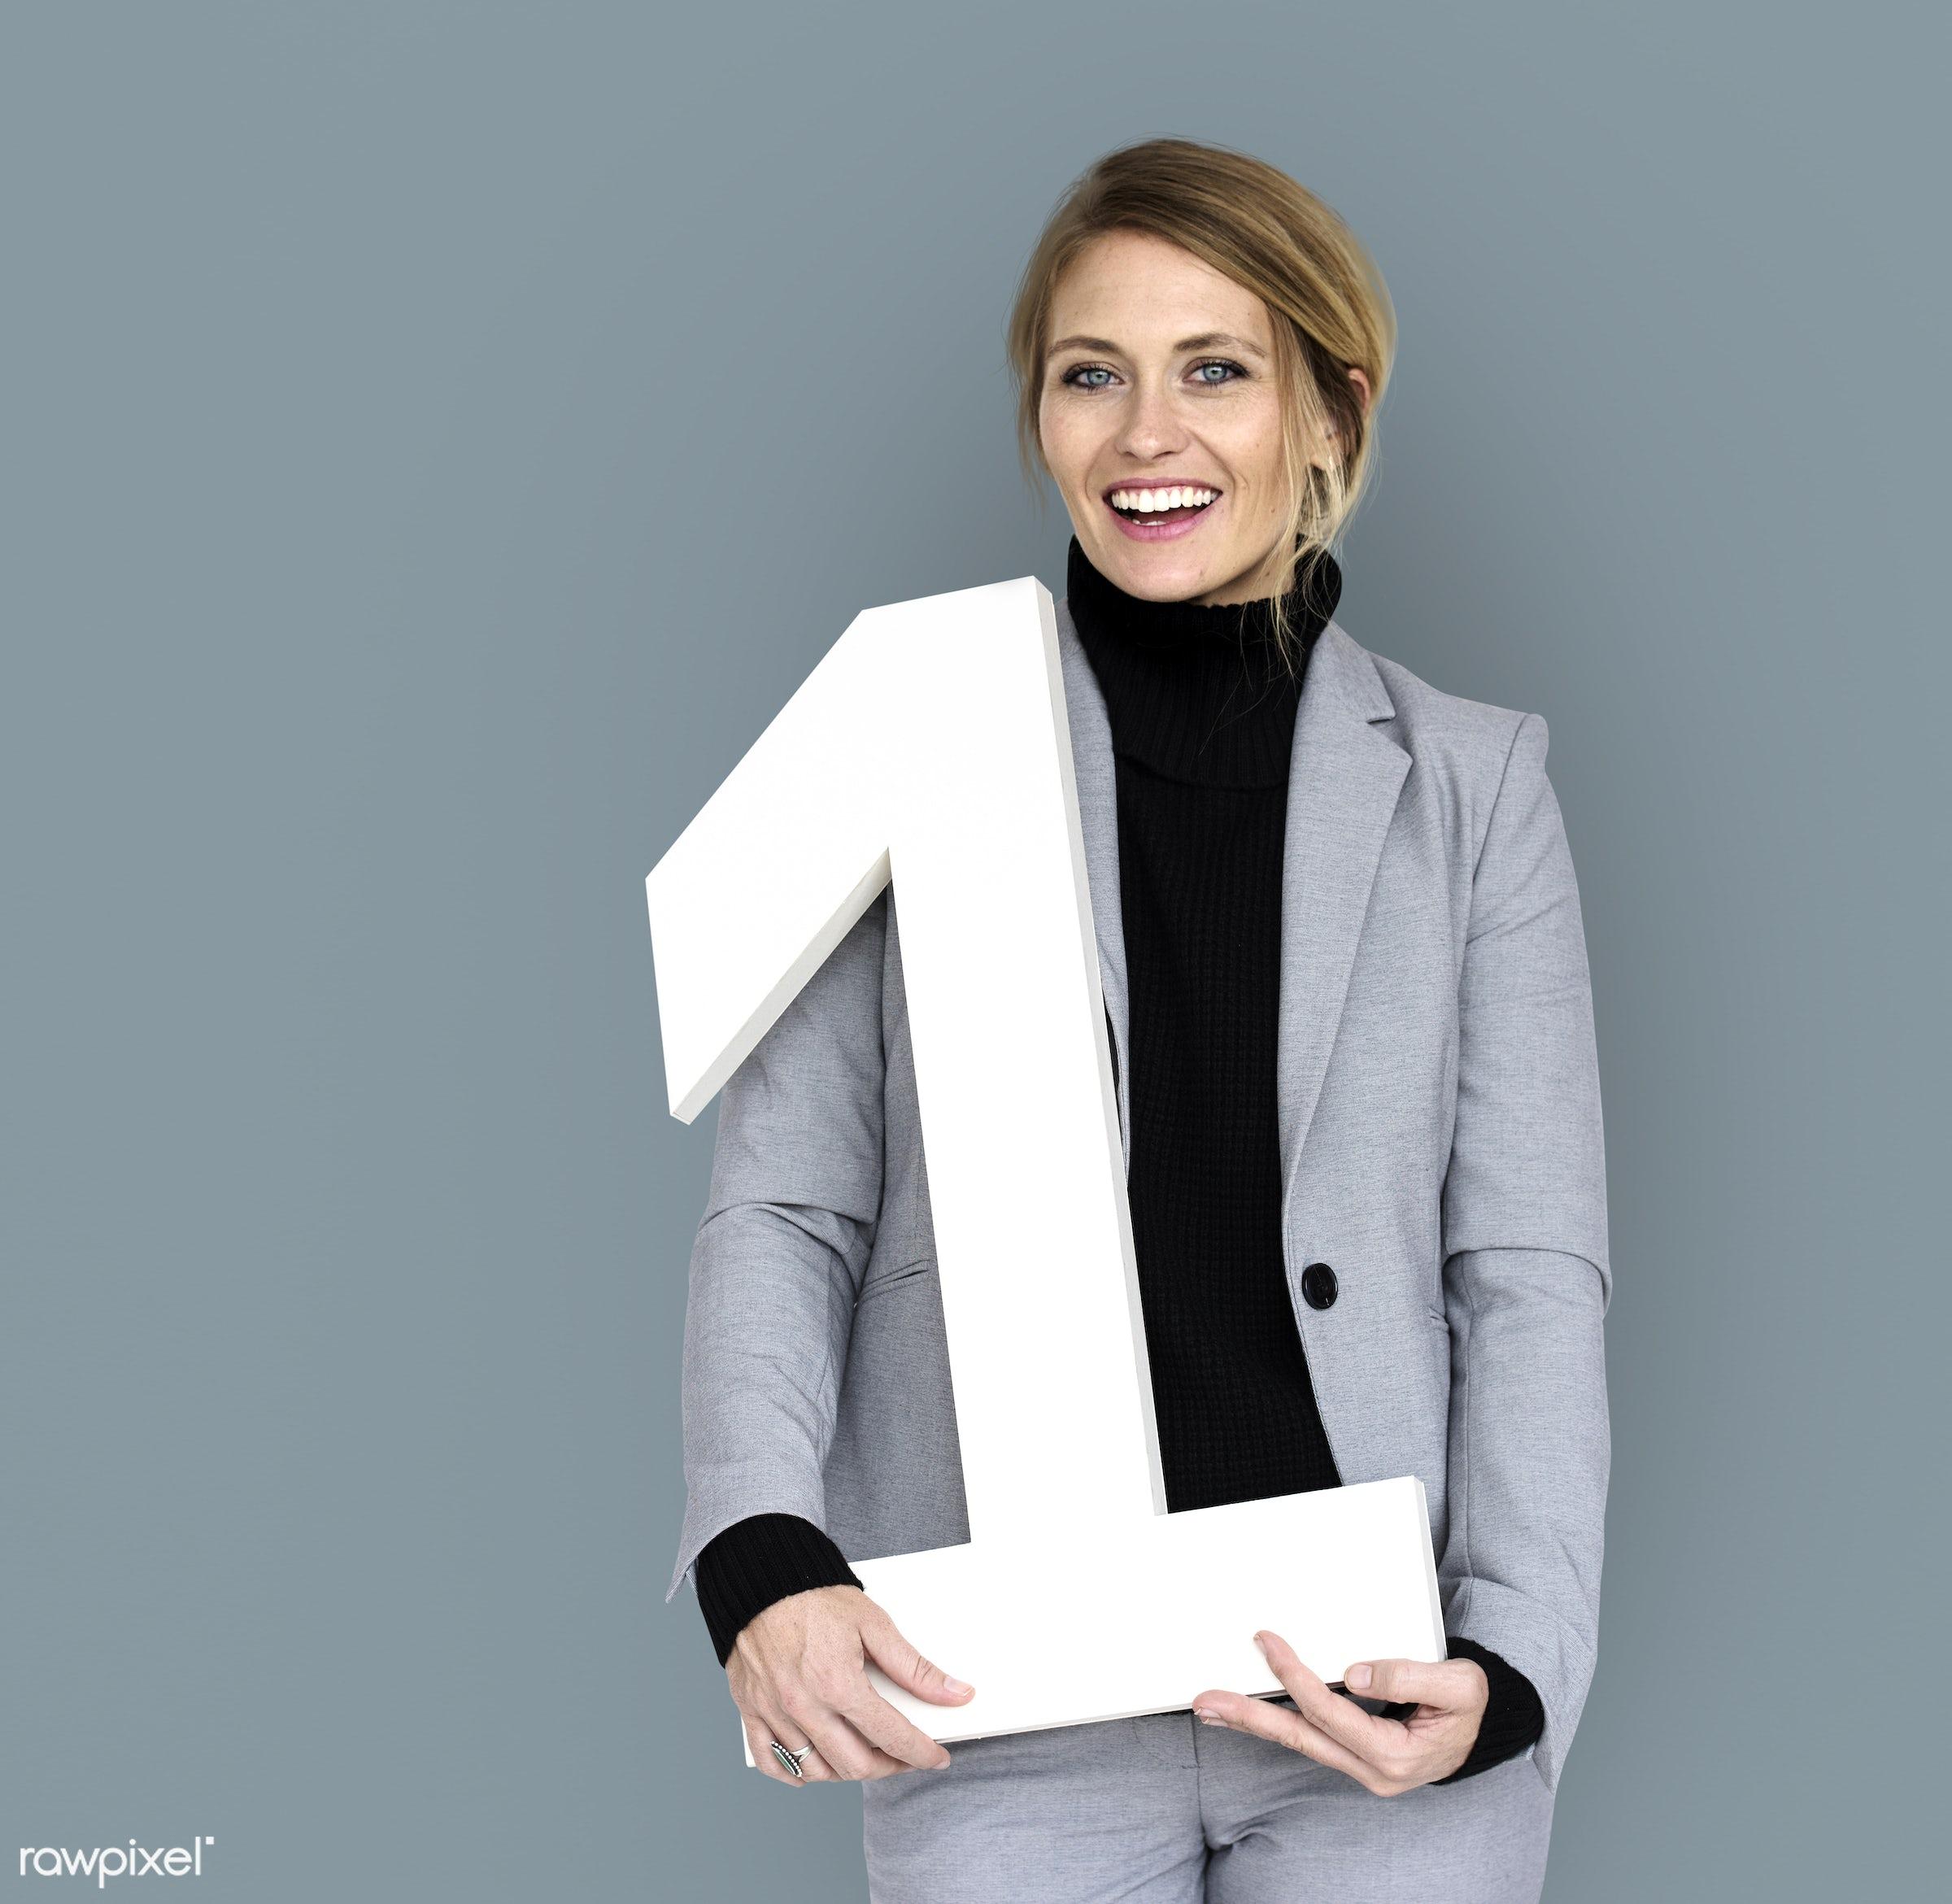 expression, studio, person, business wear, joy, achieve, people, caucasian, rank, girl, joyous, woman, happy, smile,...